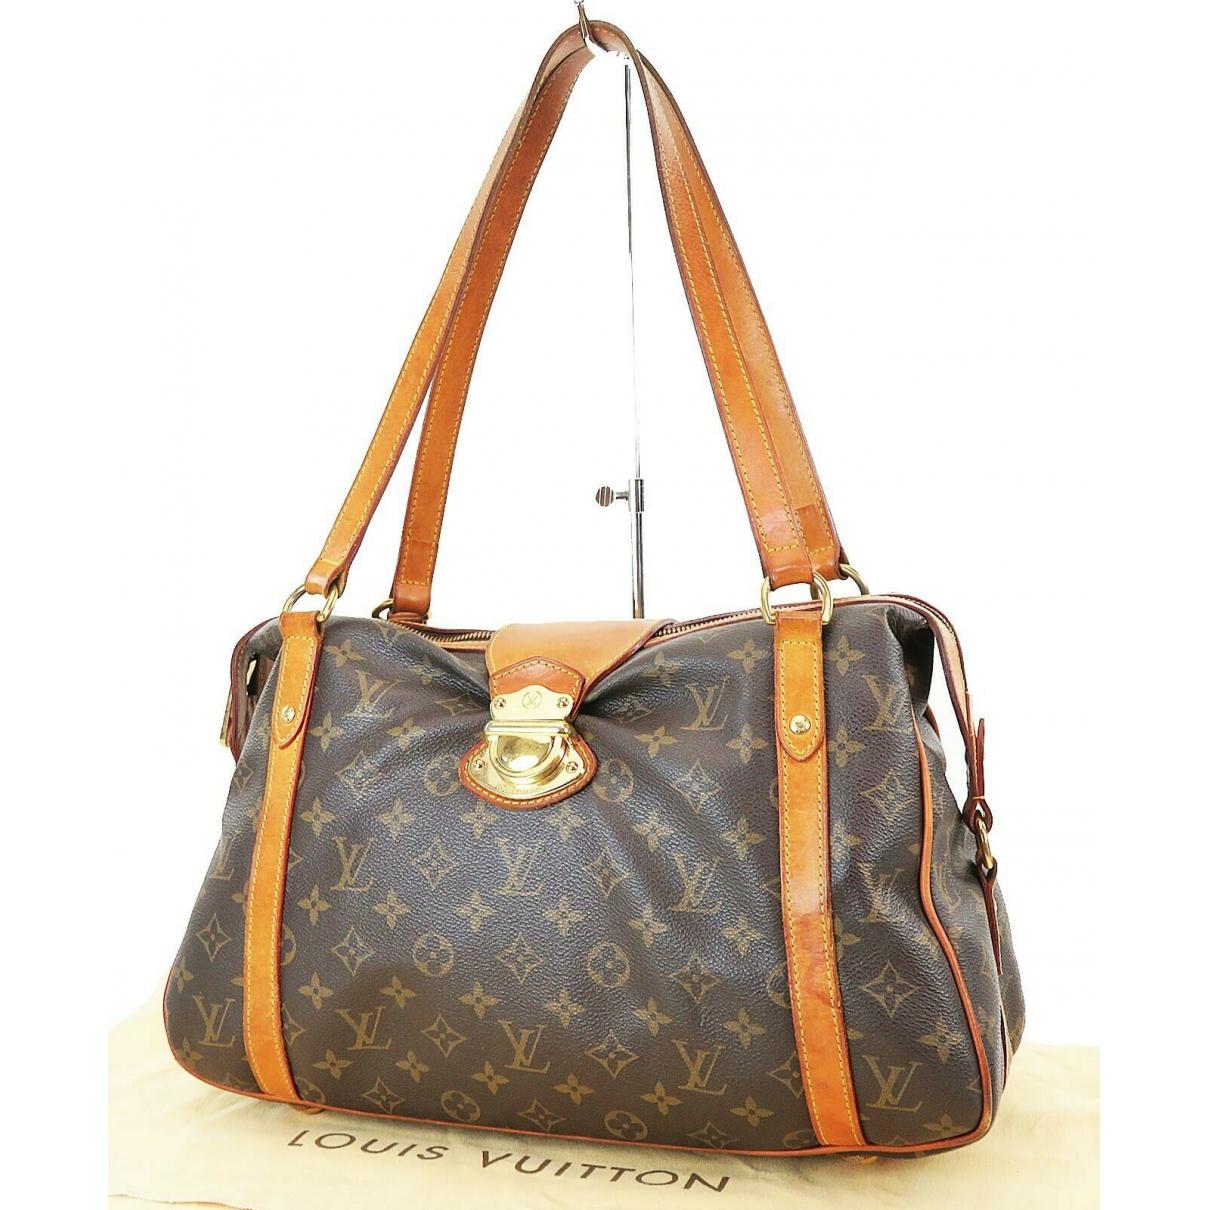 Louis Vuitton - Sac a main Stresa pour femme en cuir - marron